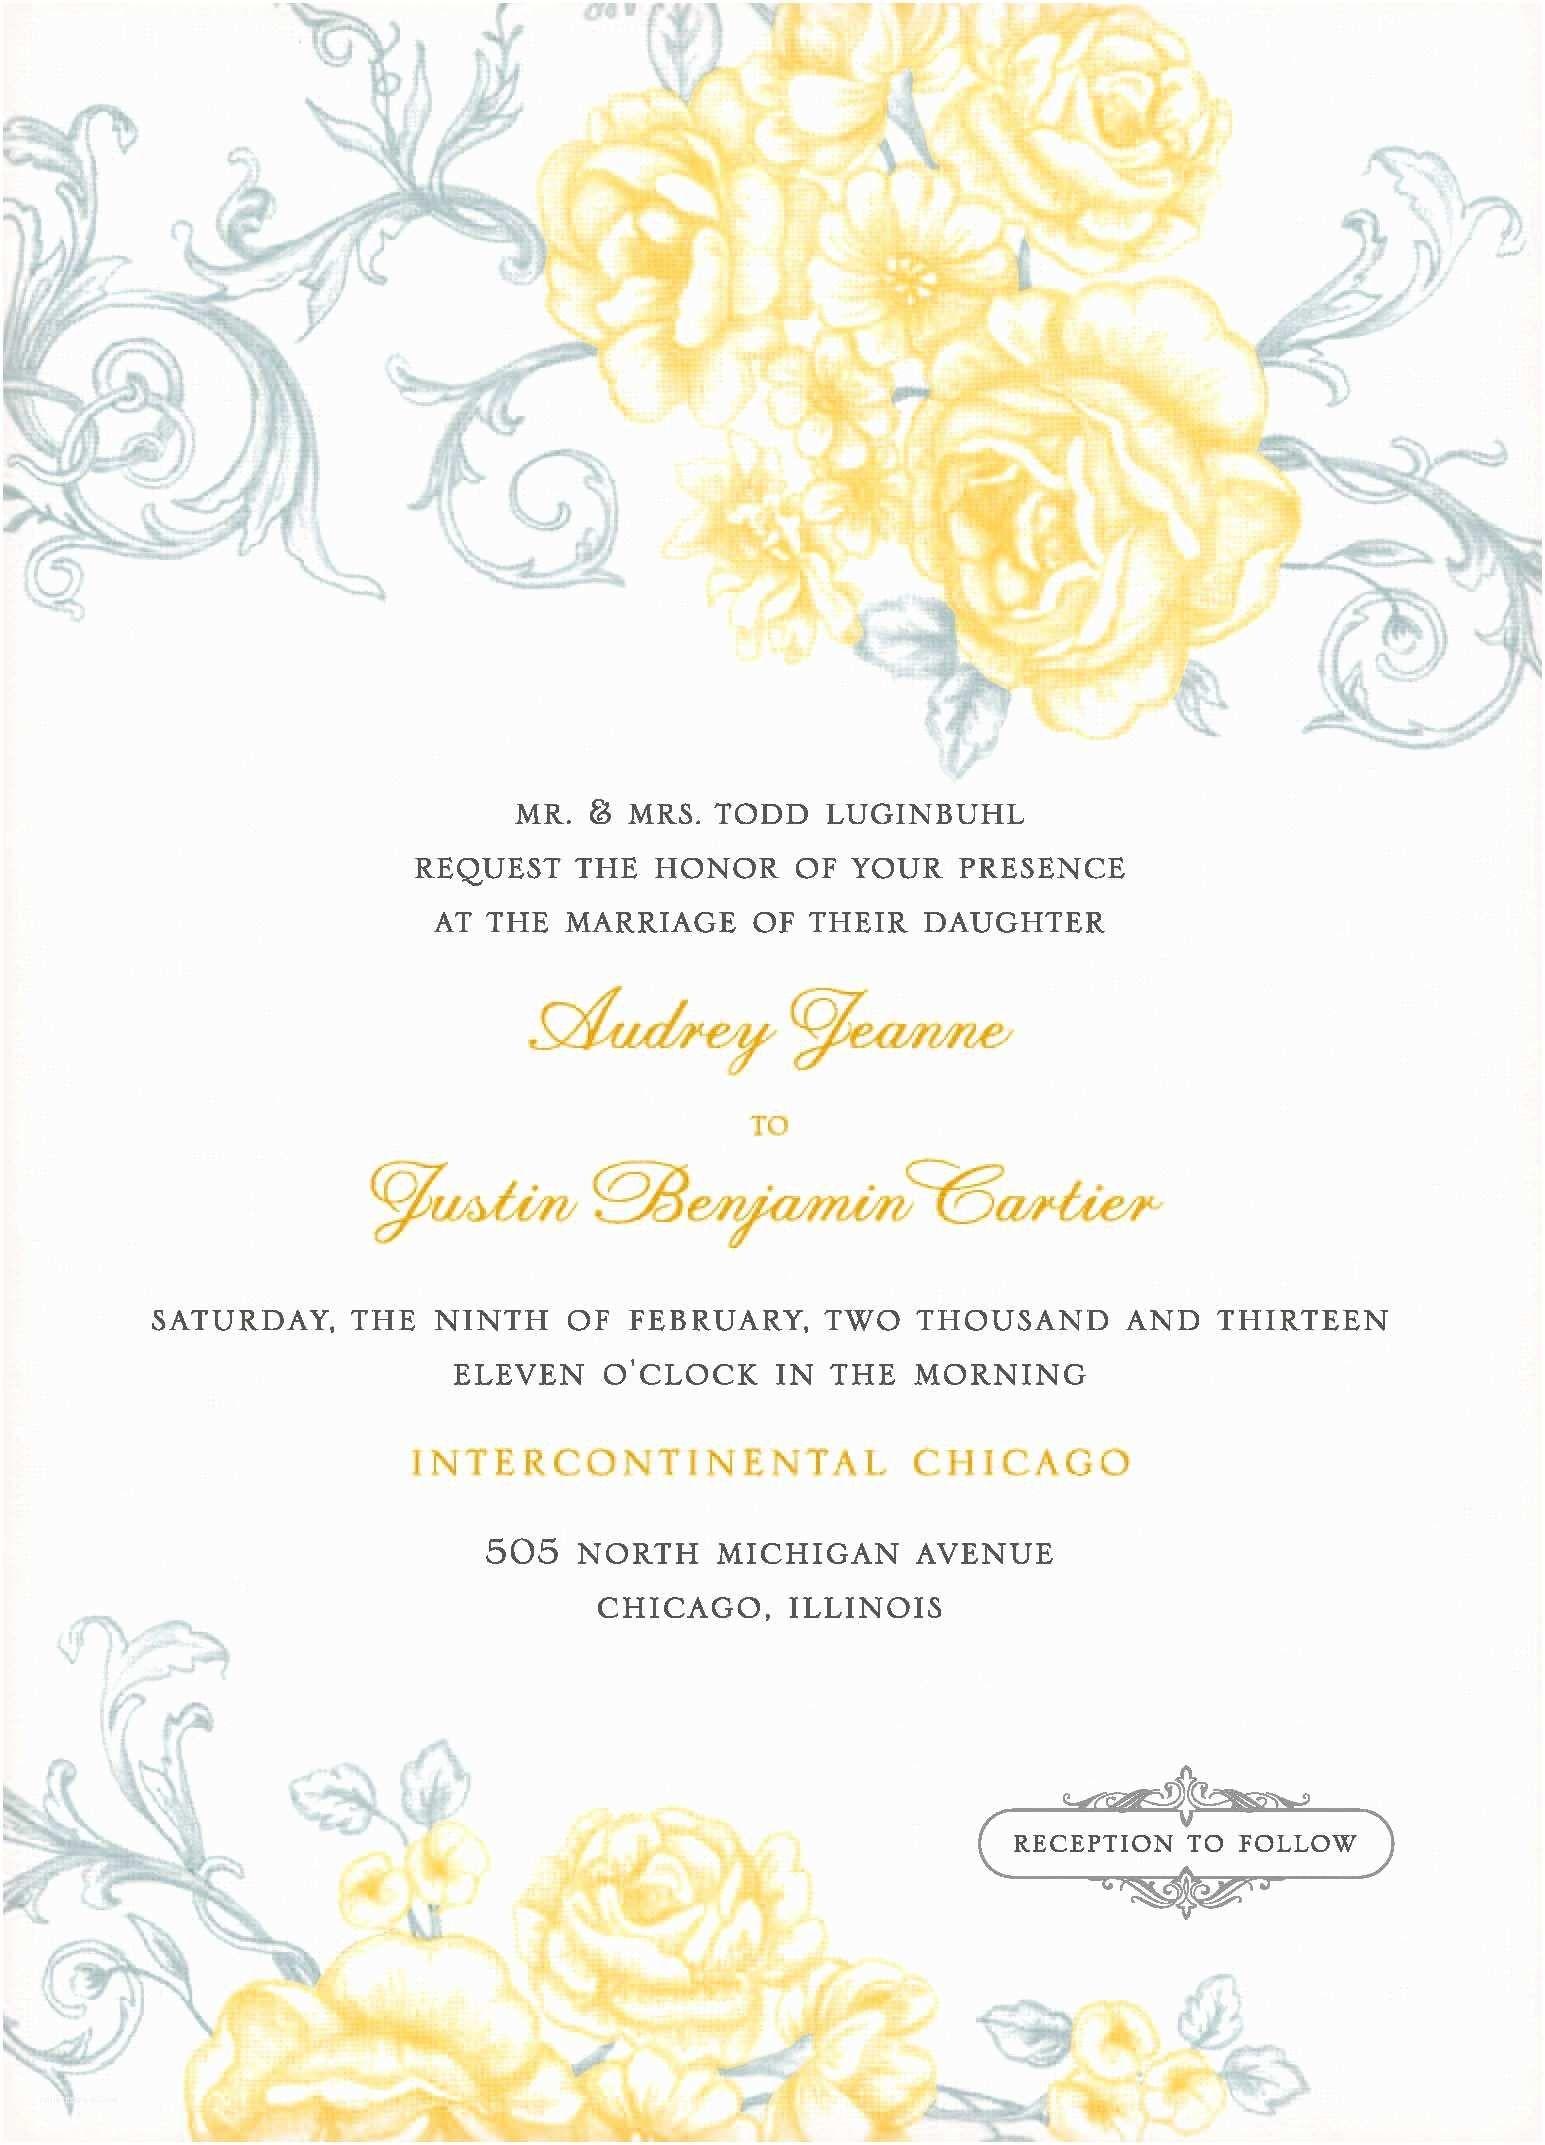 005 Impressive Free Wedding Template For Word Highest Clarity  Invitation In Marathi MenuFull